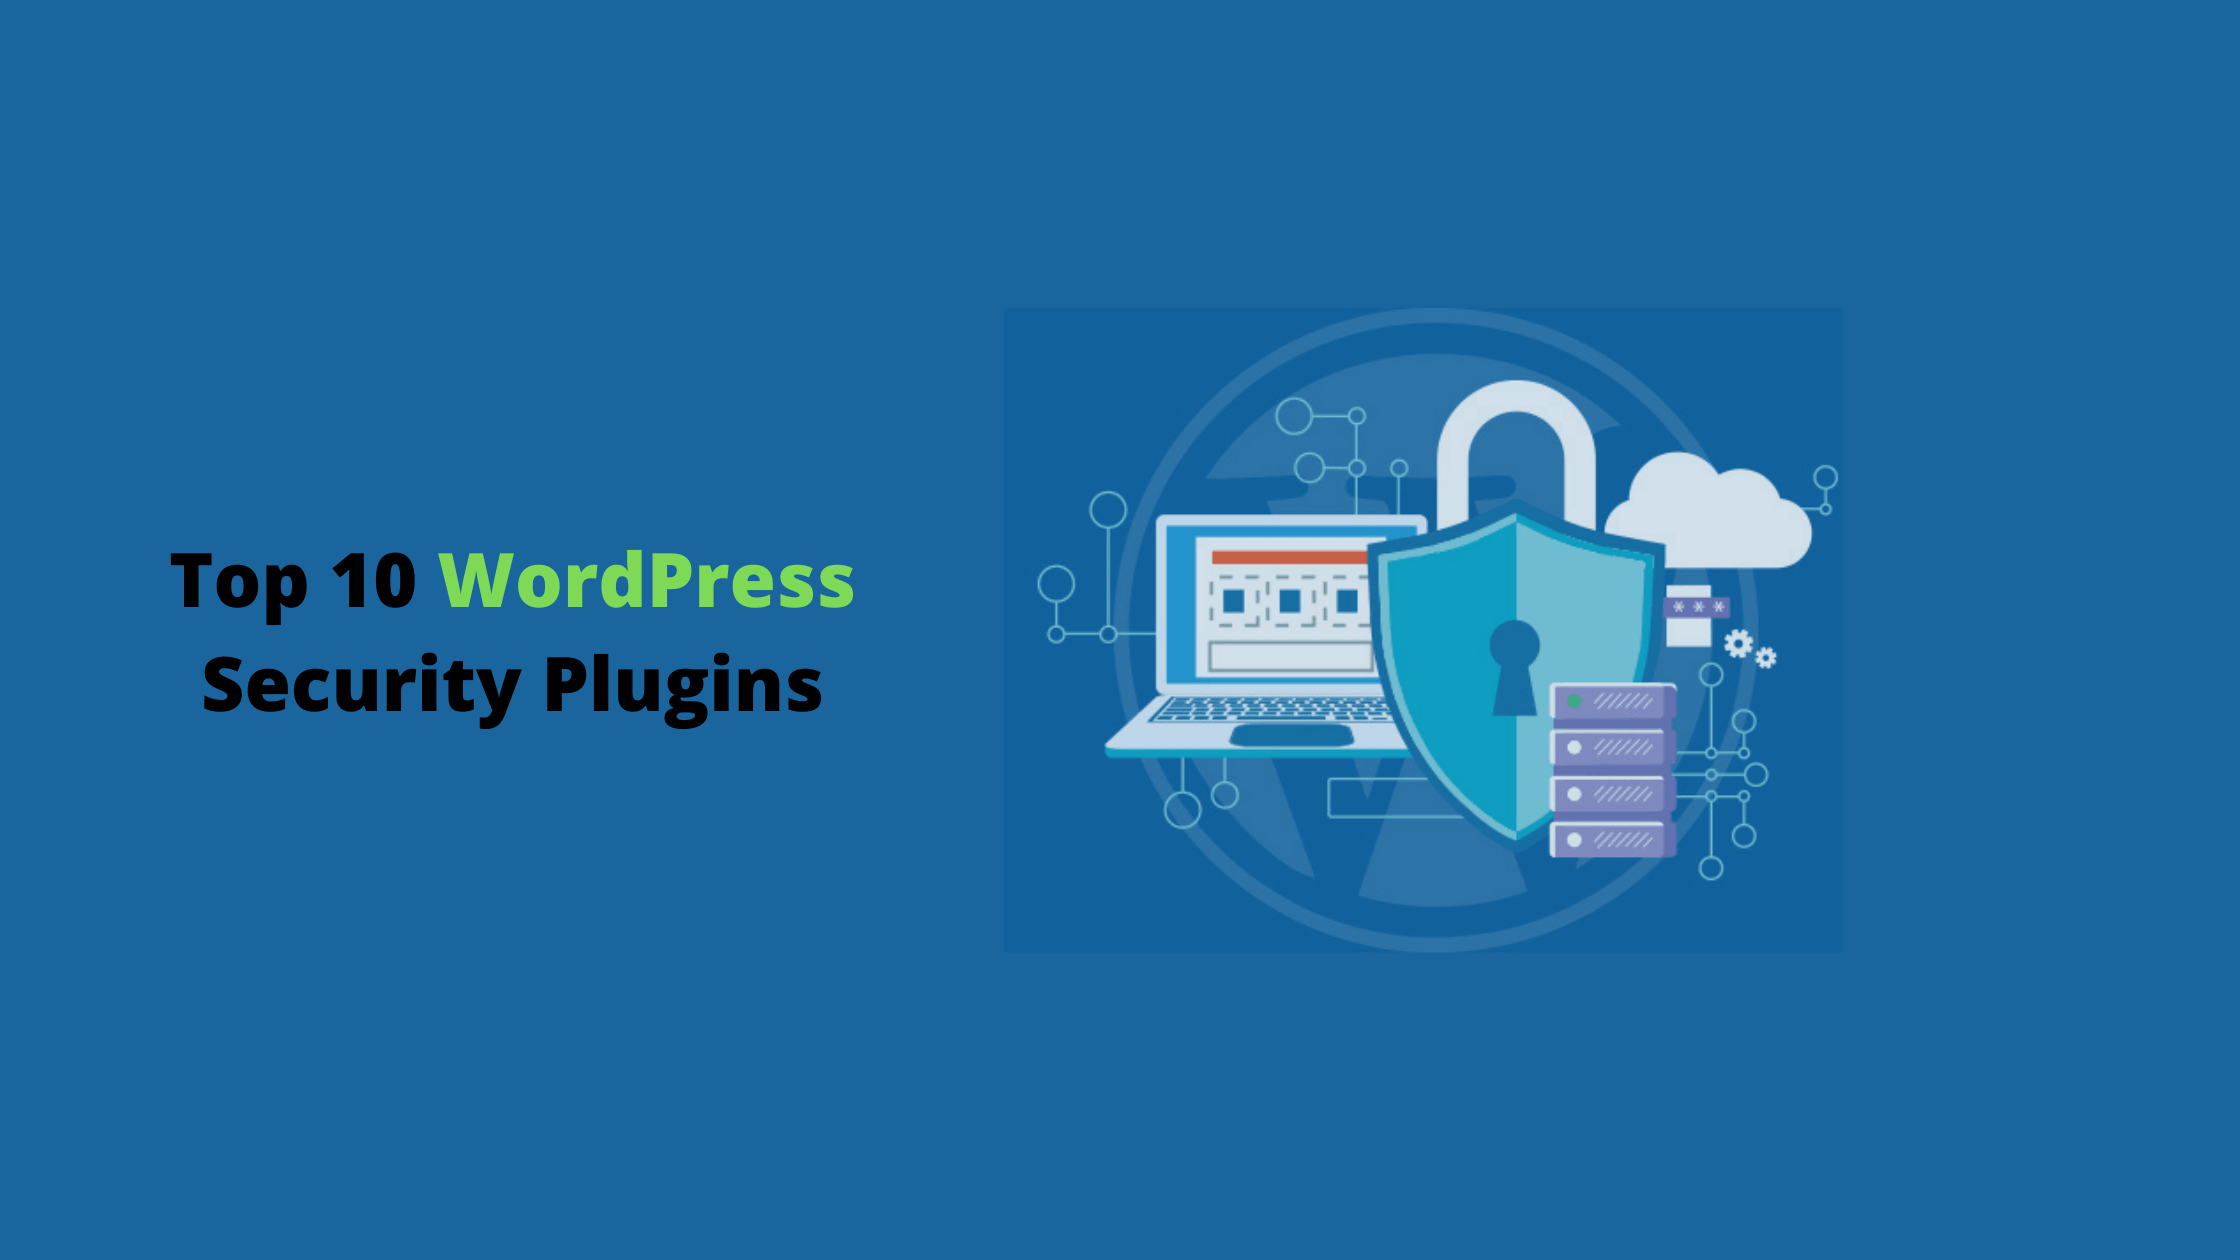 Top 10 WordPress Security Plugins